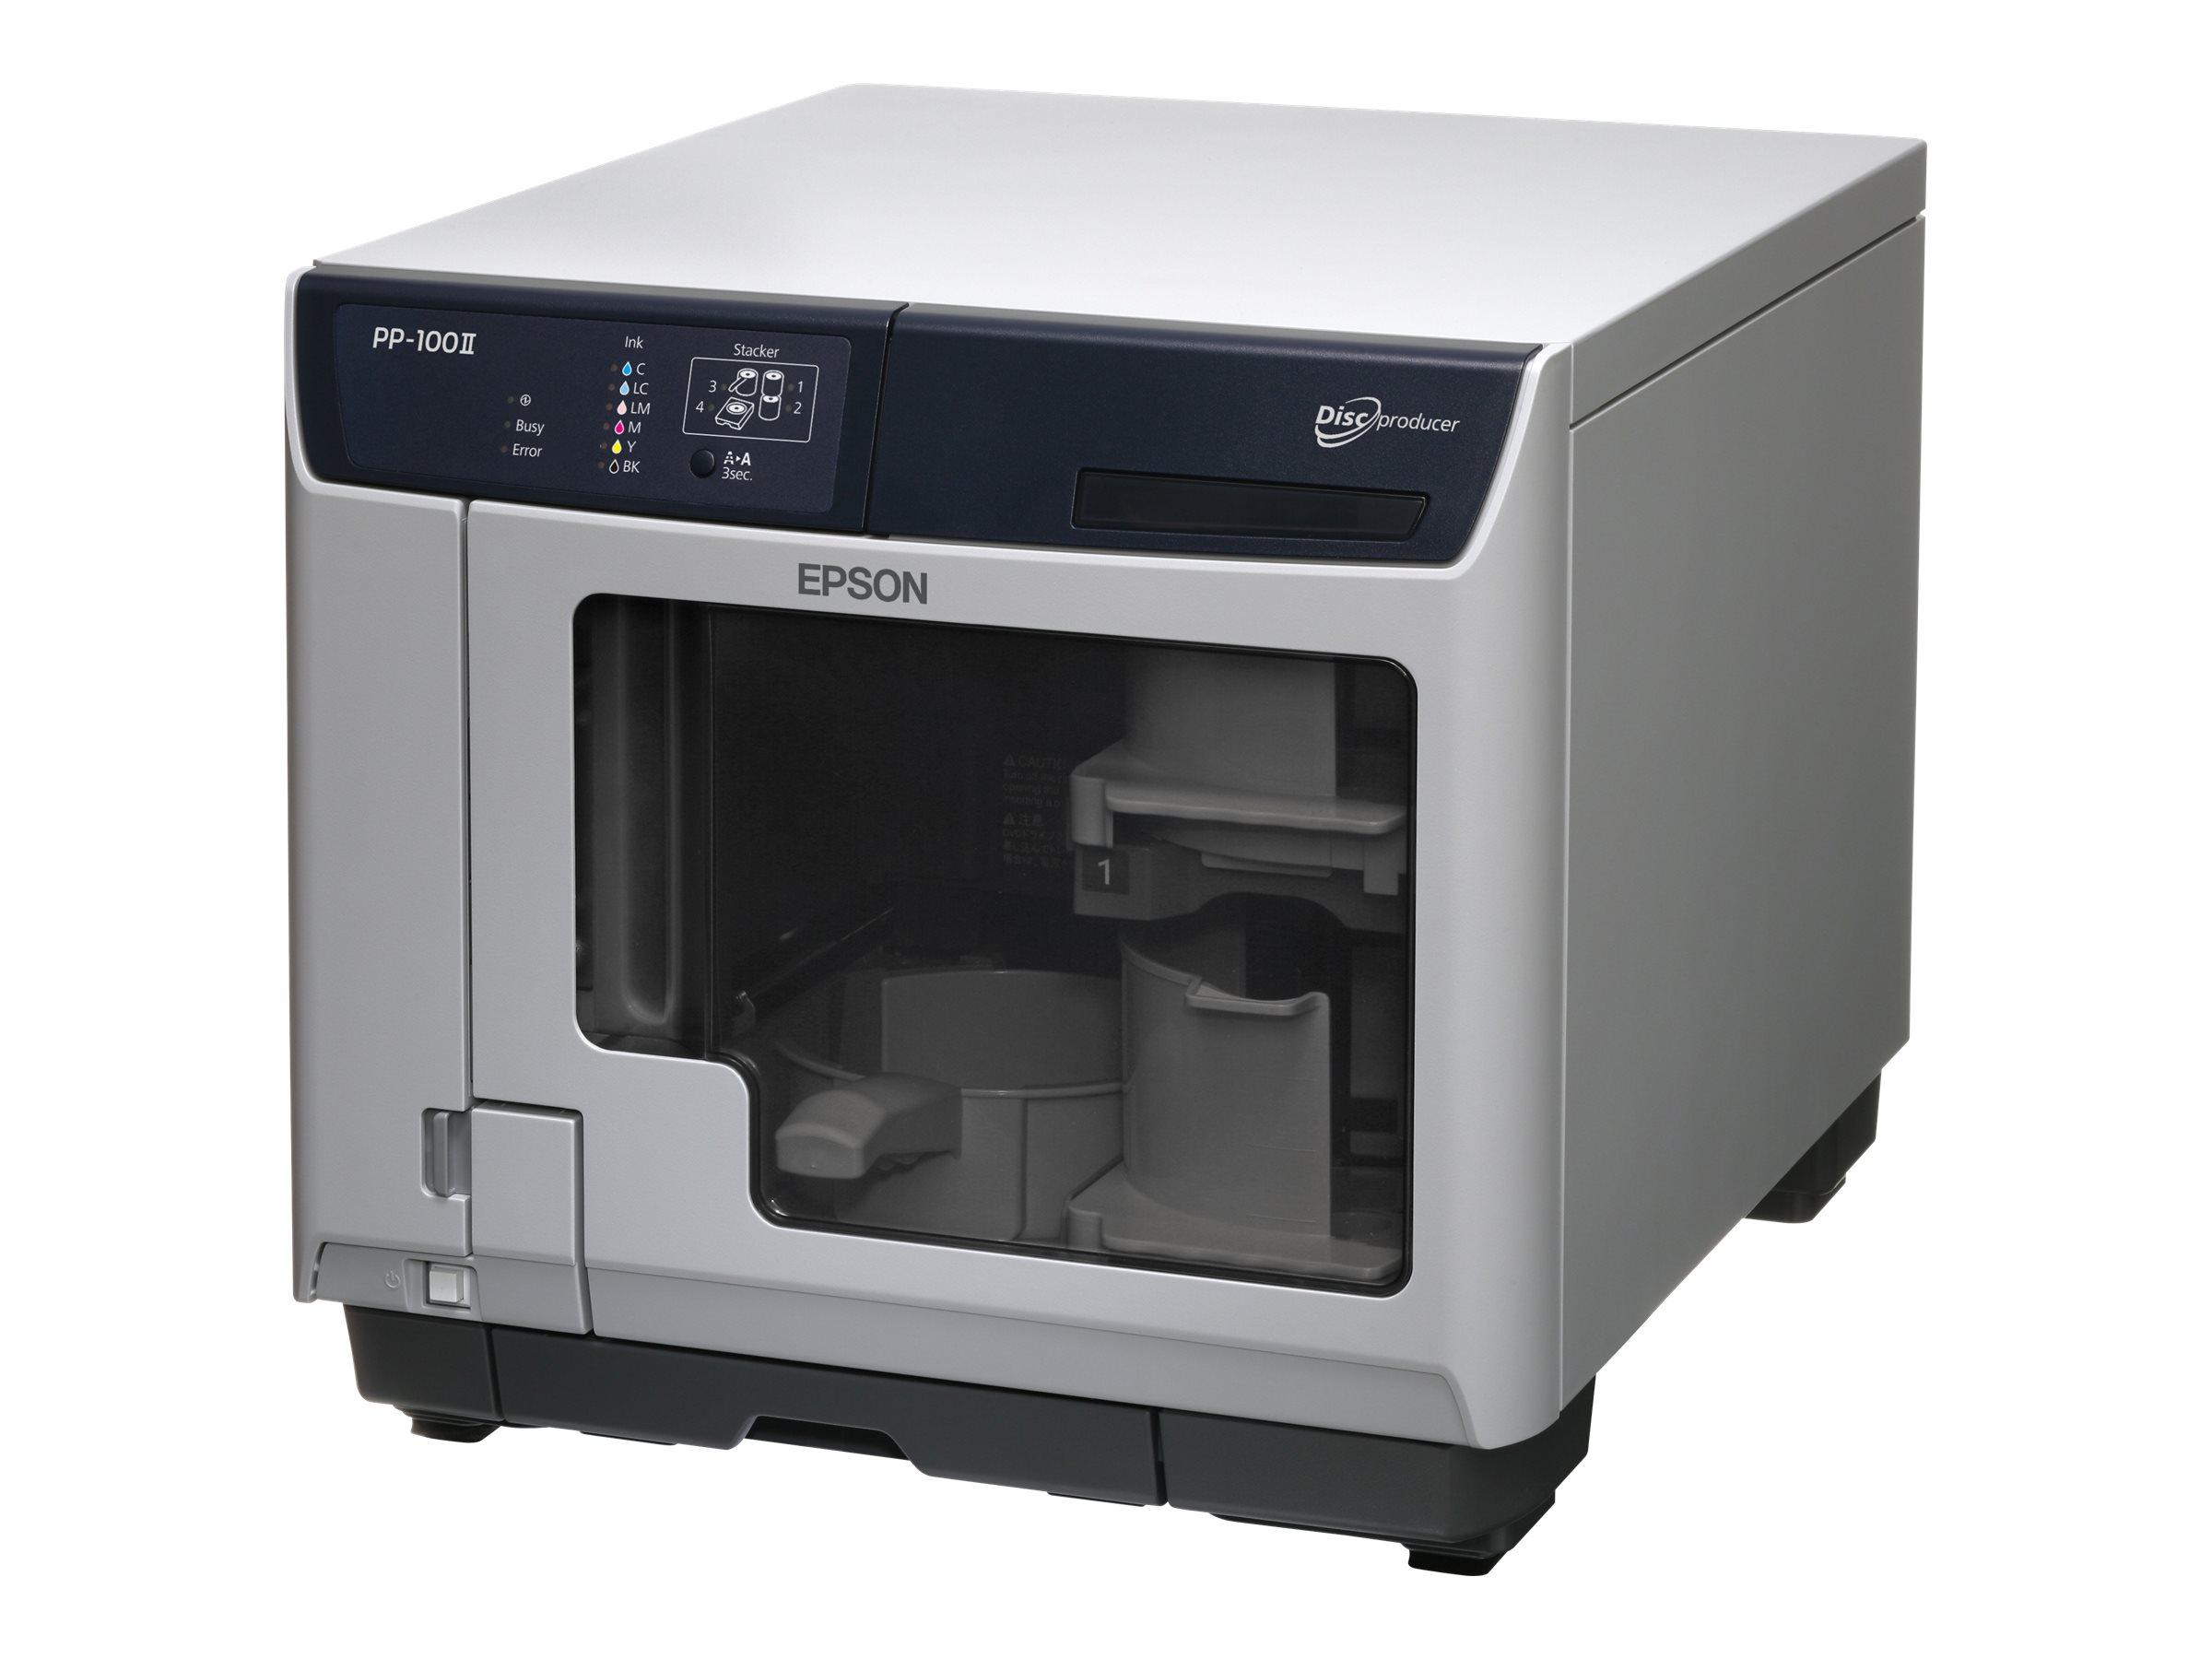 Epson Discproducer PP-100II - Disk-Kopiergerät - Steckplätze: 100 - DVD±R (±R DL) x 2 - SuperSpeed USB 3.0 - extern